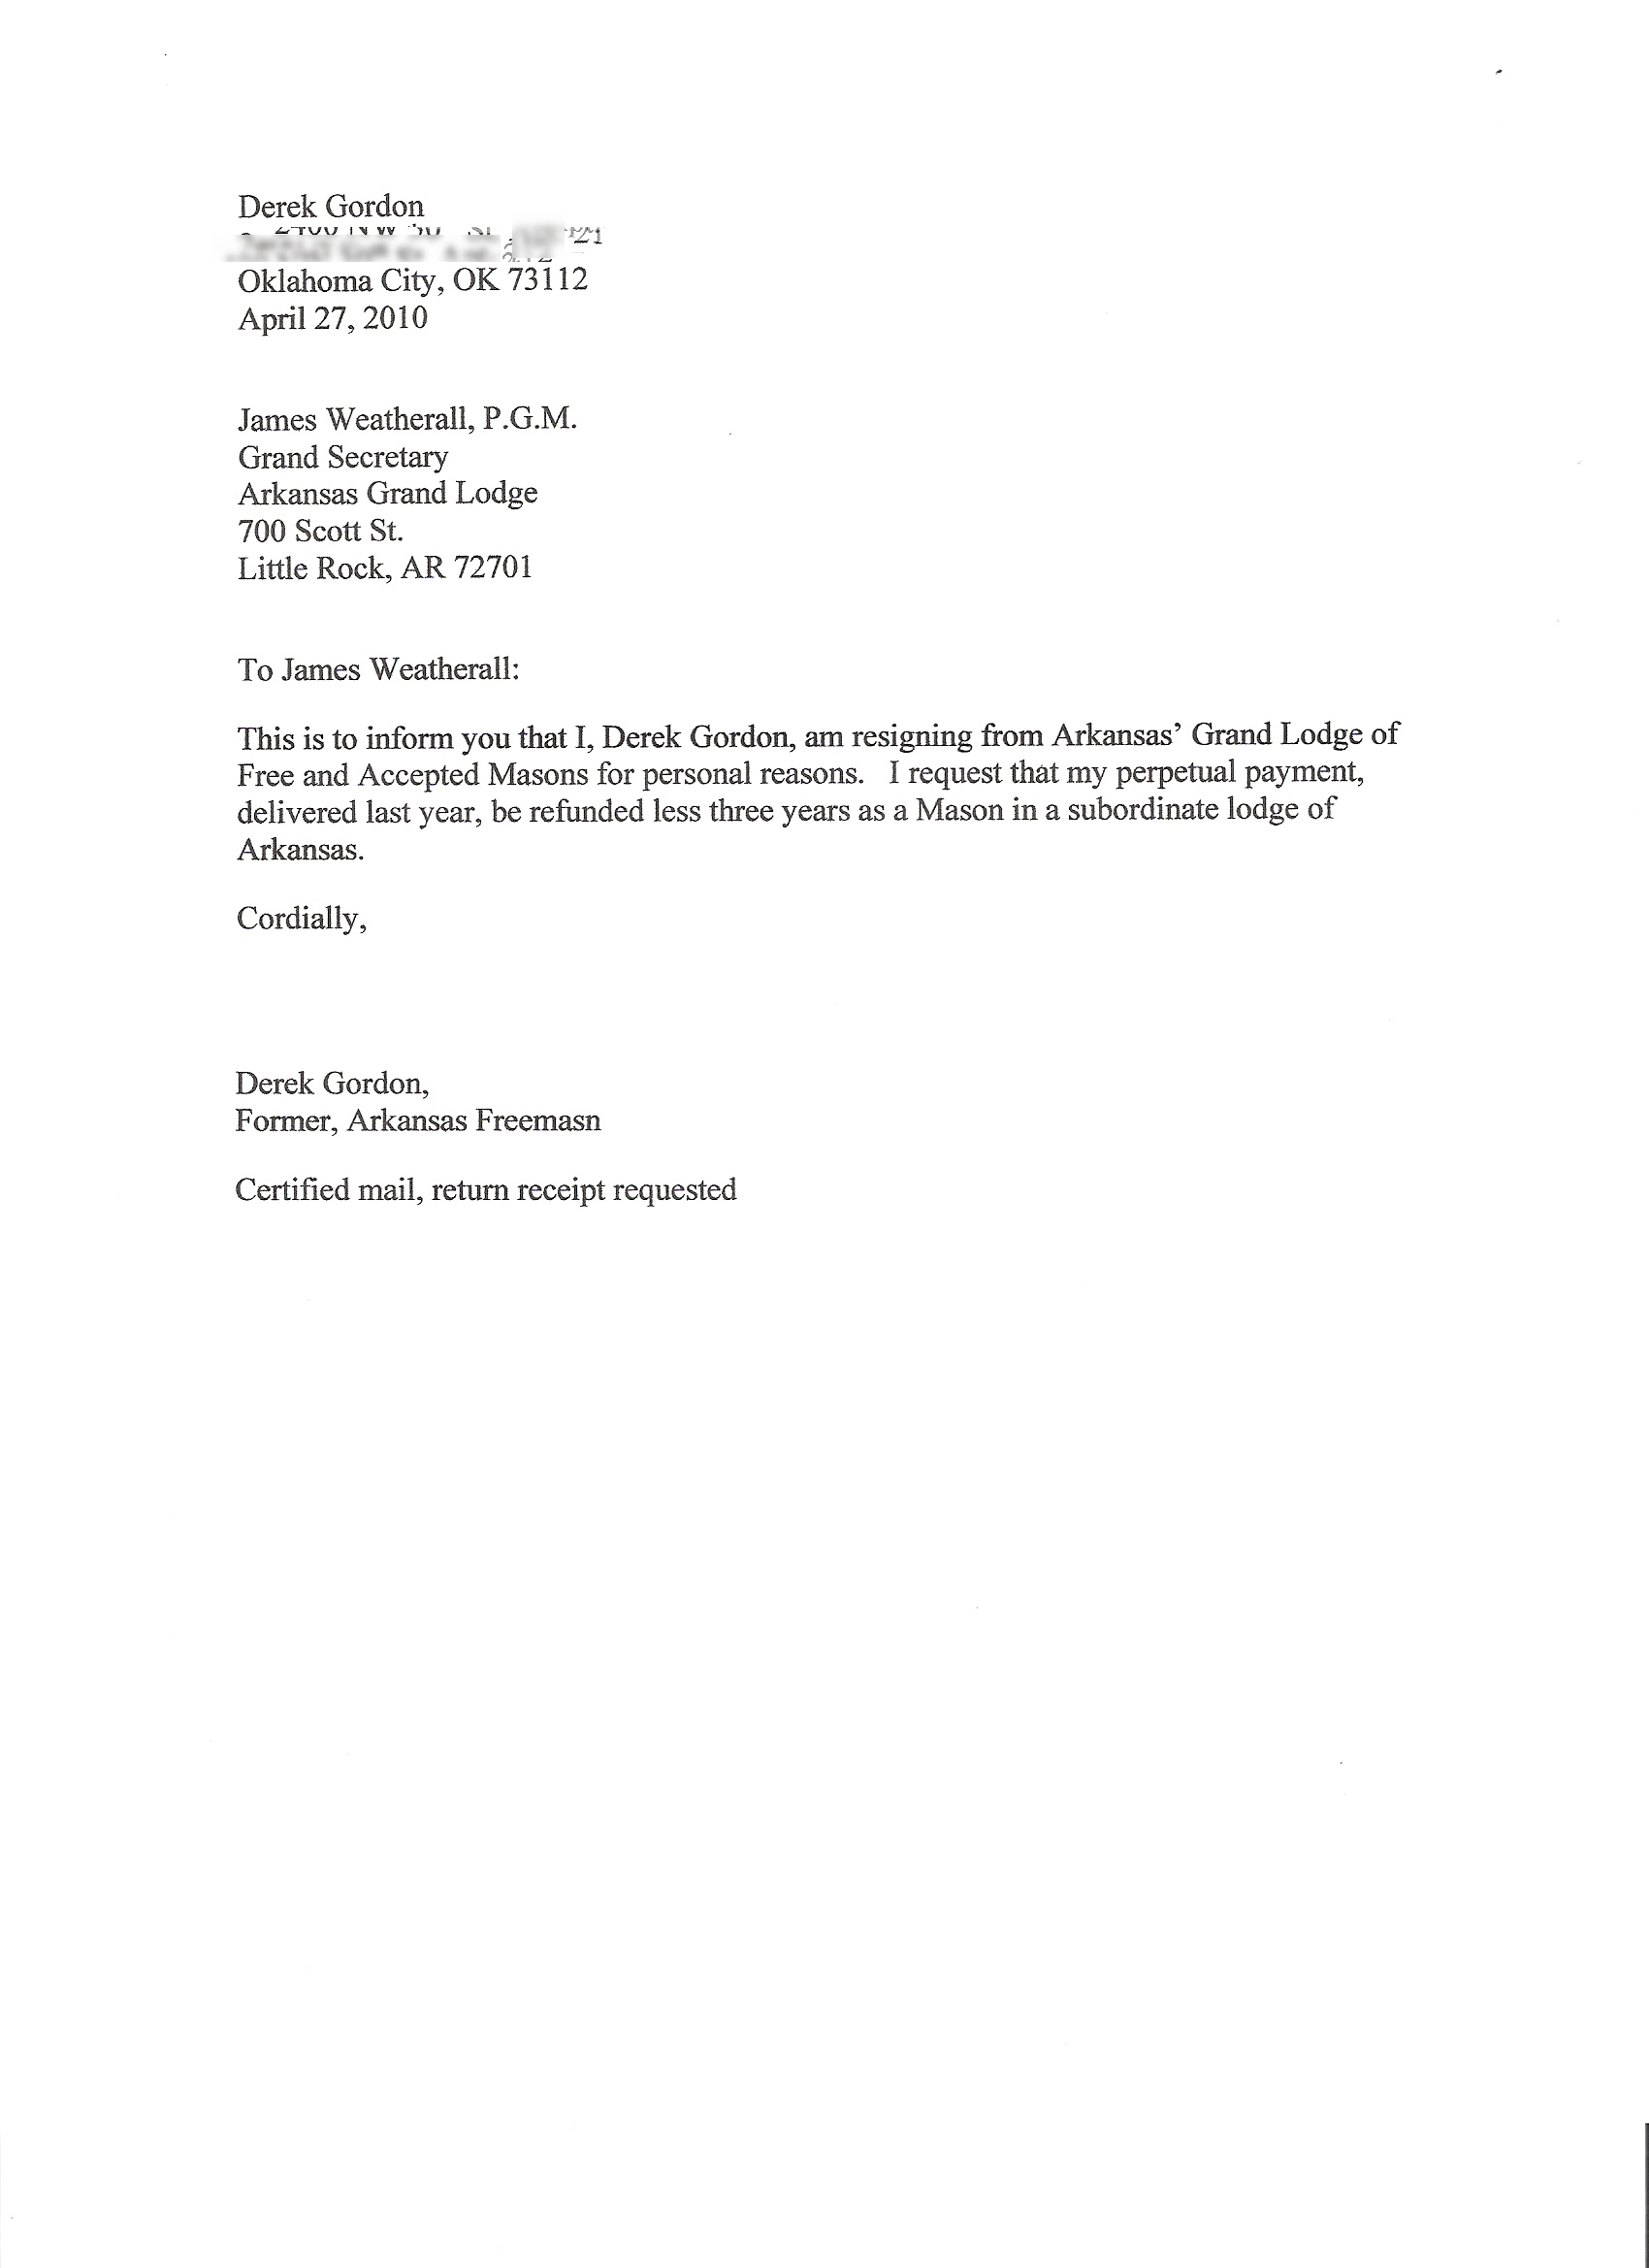 Resignation From Work